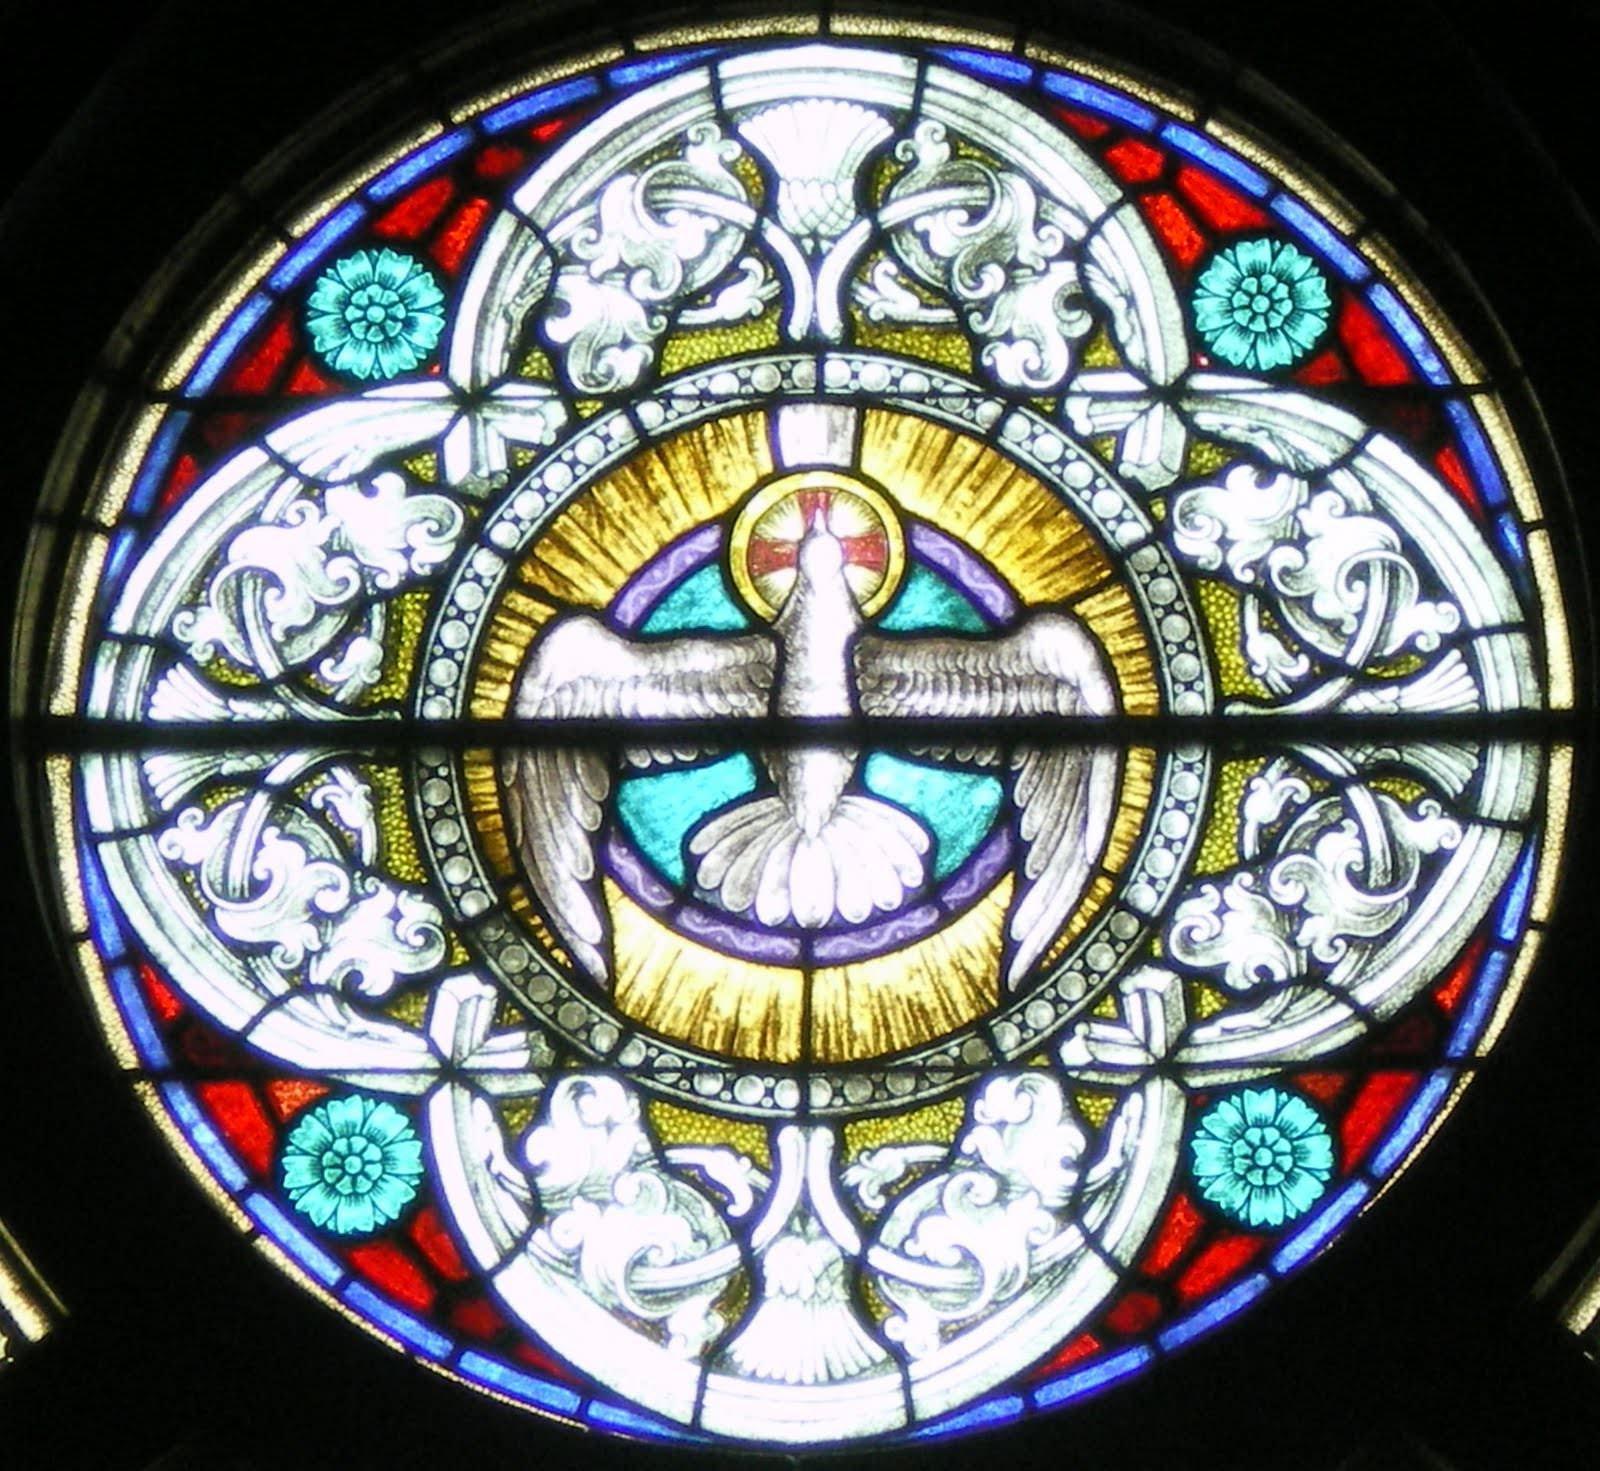 fulgentius ruspe eucharist sacrament charity unity